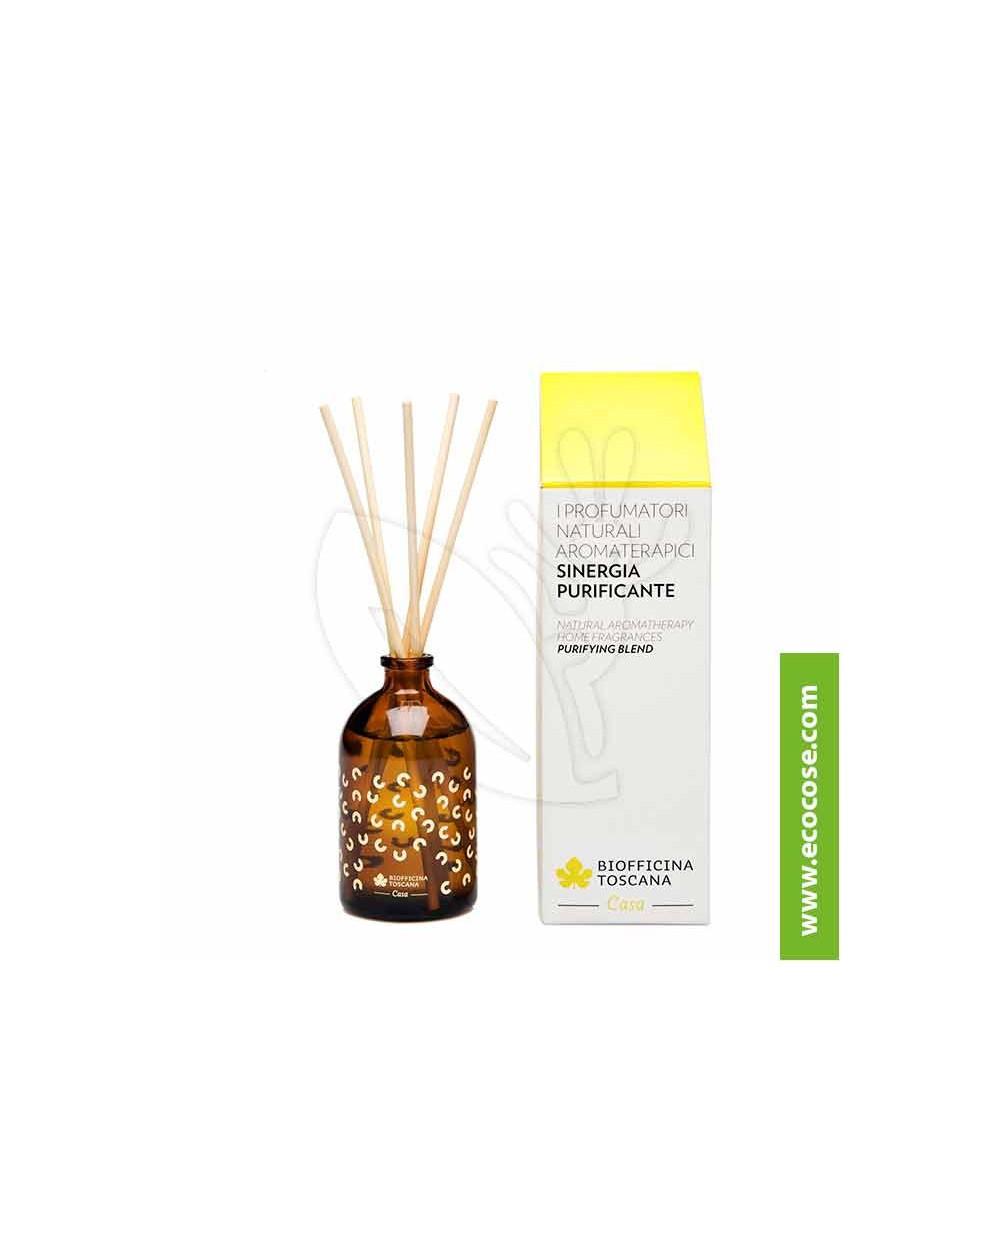 Biofficina Toscana - Profumatore naturale aromaterapico – Sinergia purificante